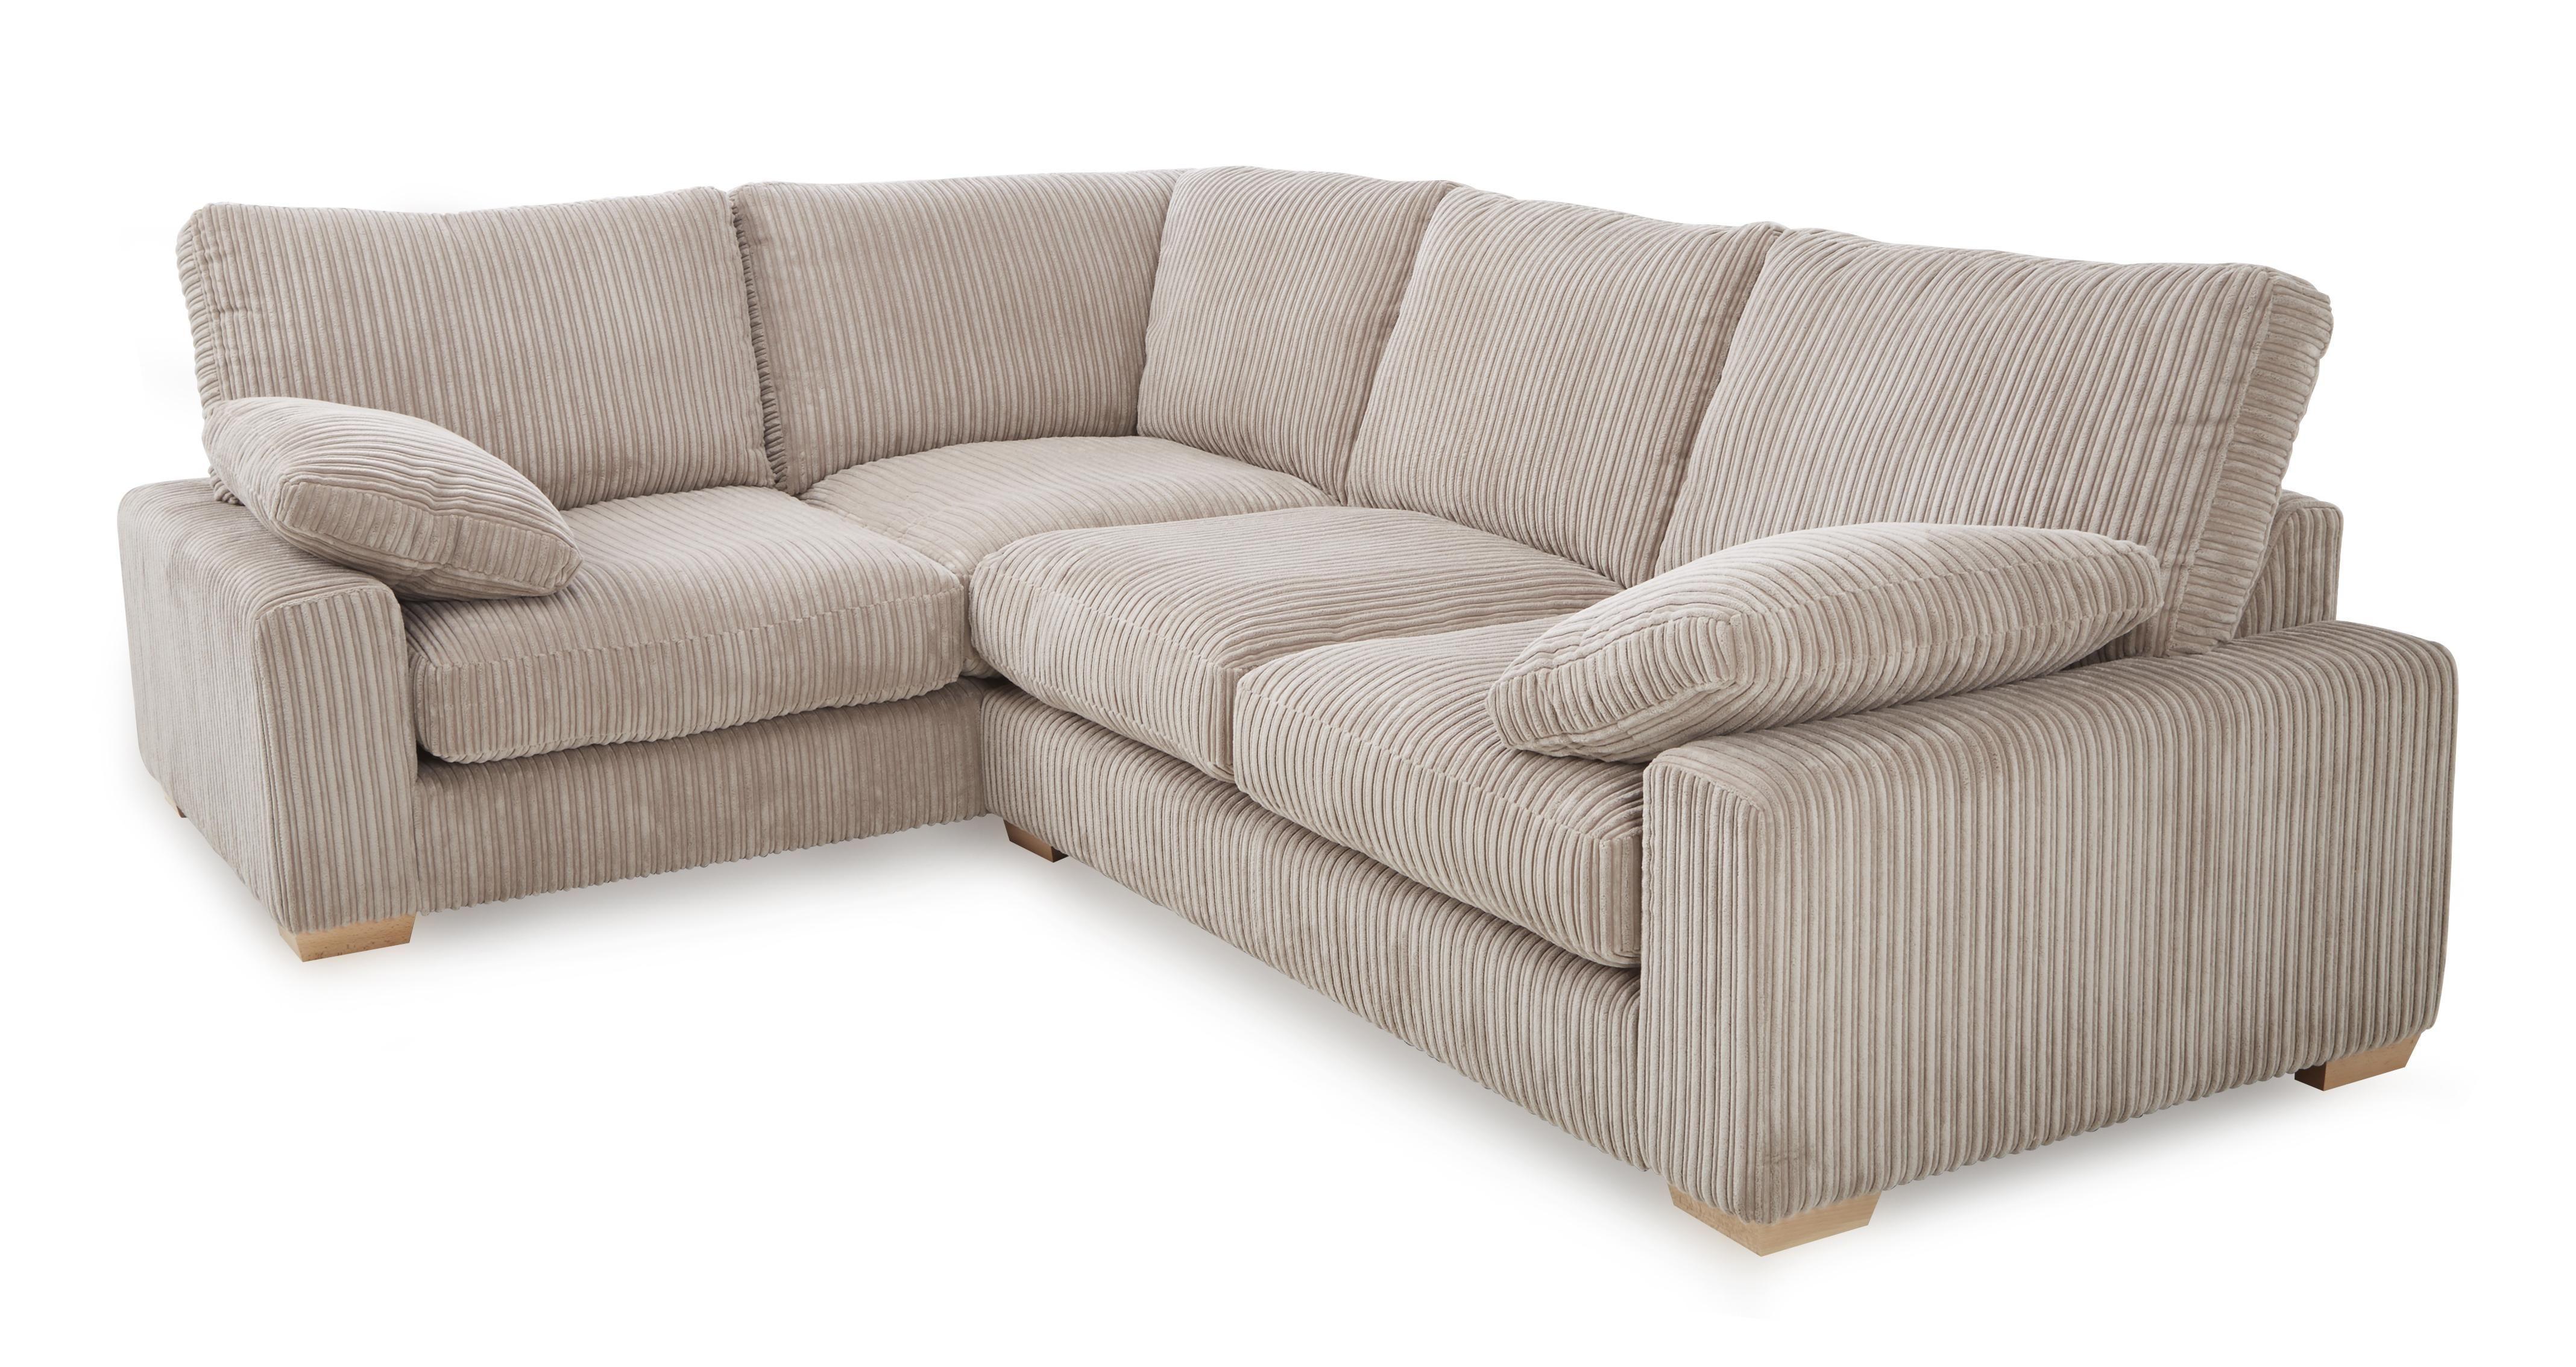 Crosby Right Hand Facing 2 Seater Corner Sofa Dfs 2 Seater Corner Sofa Corner Sofa Sofa